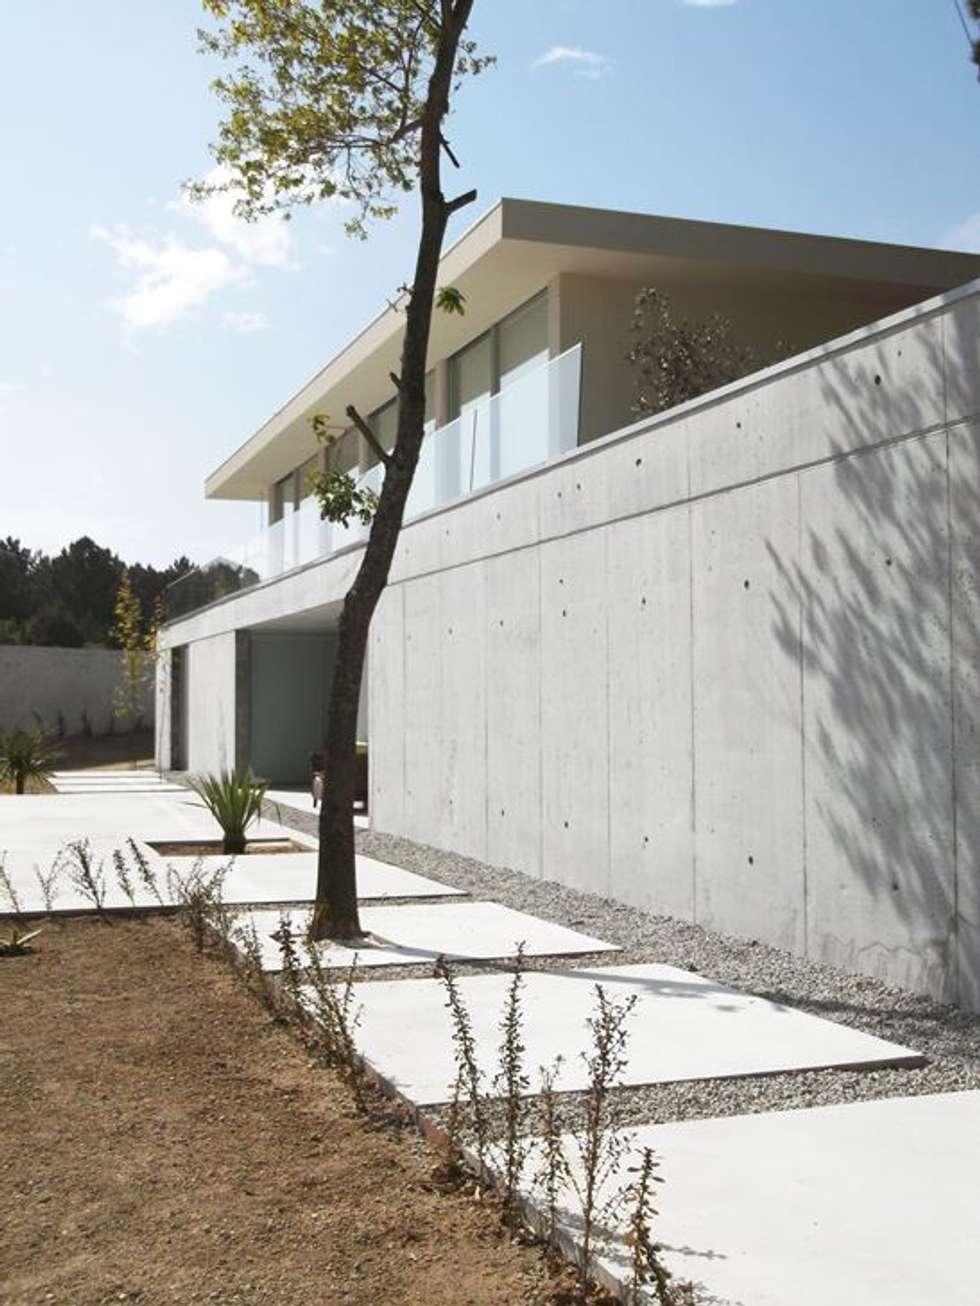 Casa Claudia: Jardins minimalistas por Artspazios, arquitectos e designers